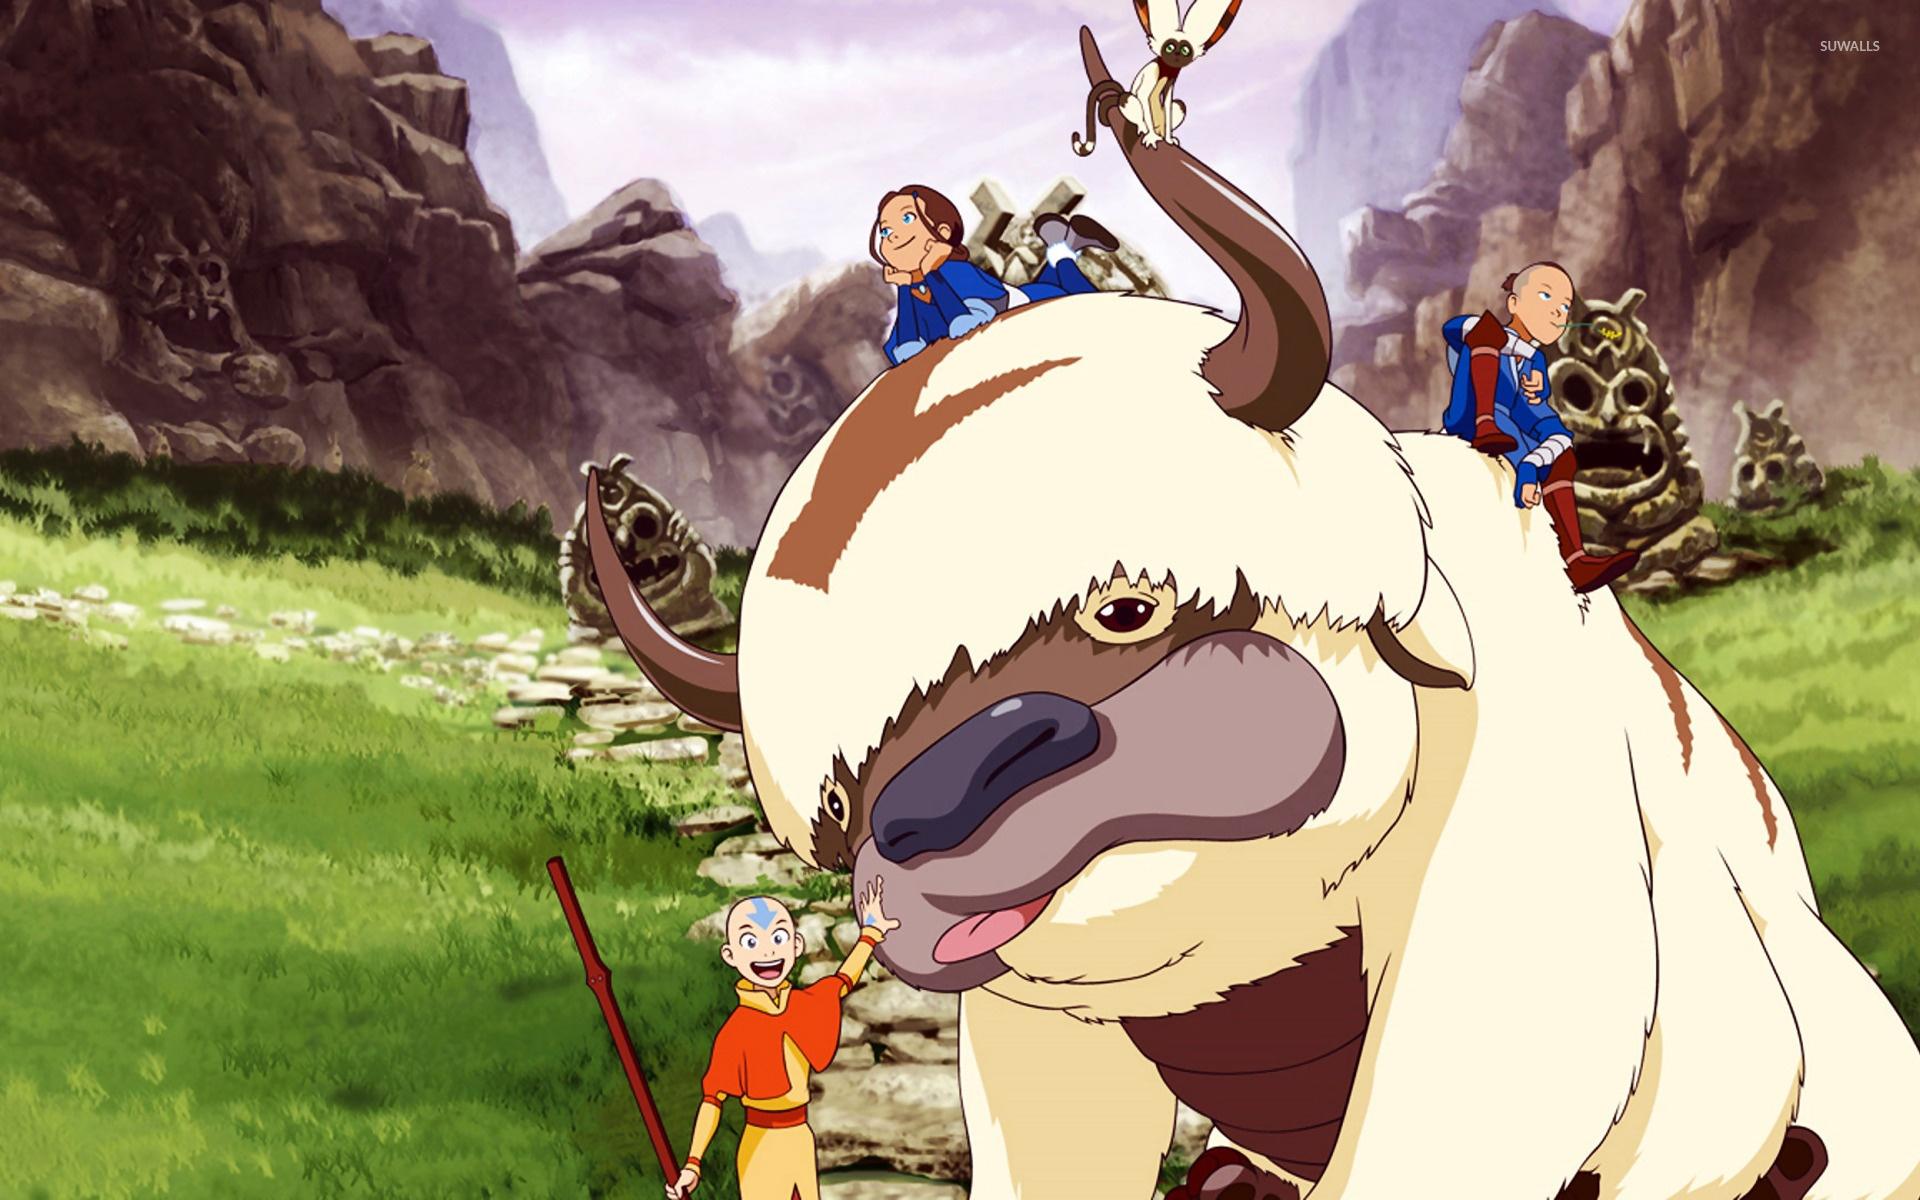 Is Avatar: The Last Airbender anime or cartoon? - Quora